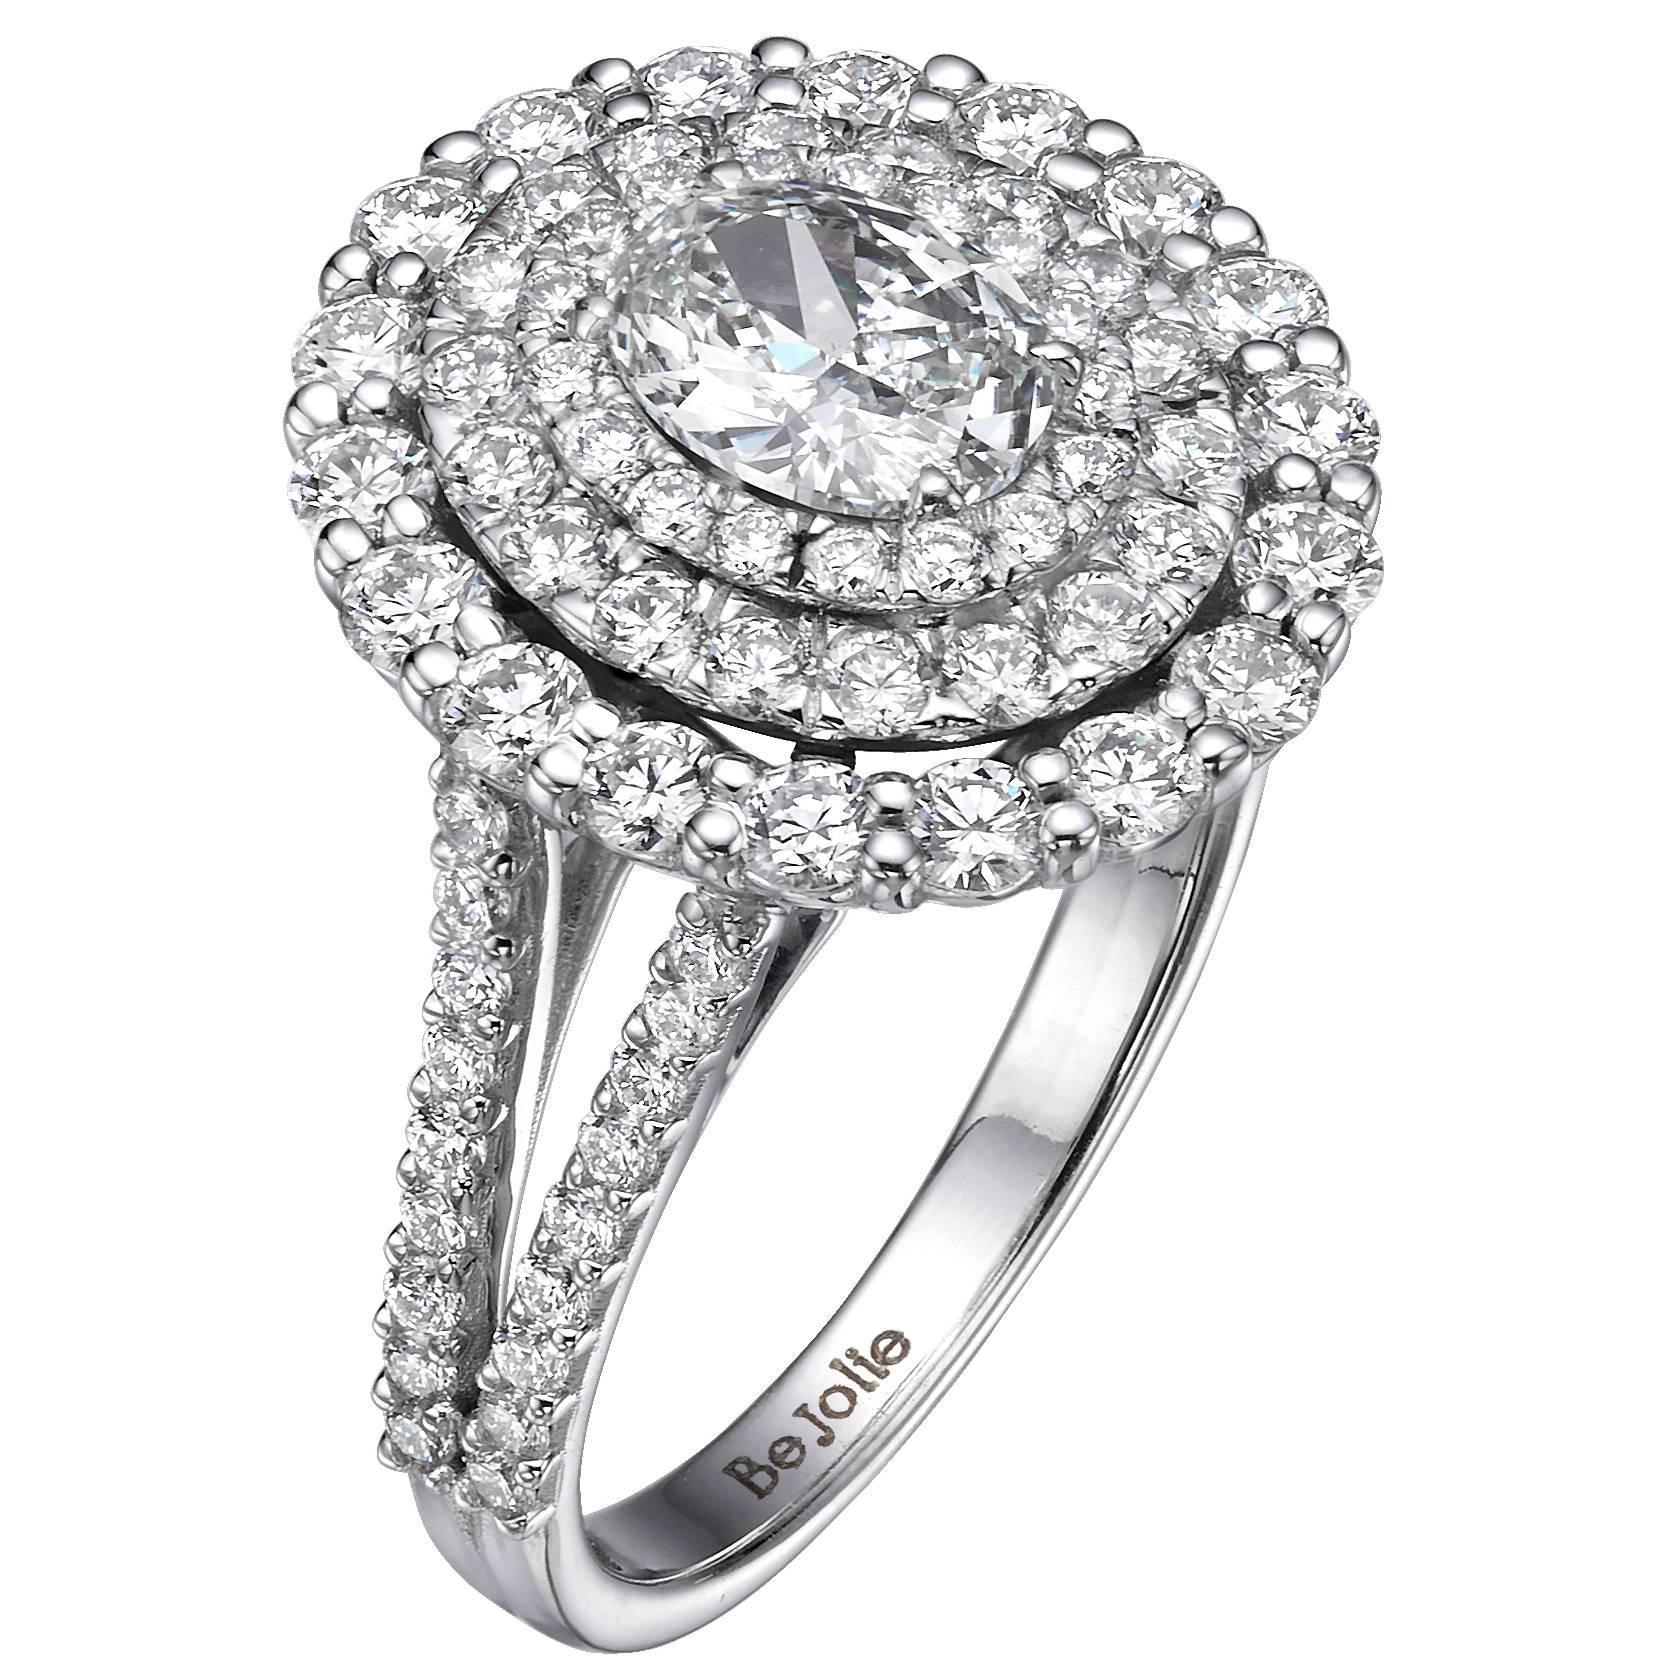 GIA Certified 2.14 Carat Oval Cut Diamond Triple Halo Engagement Ring G / VVS1